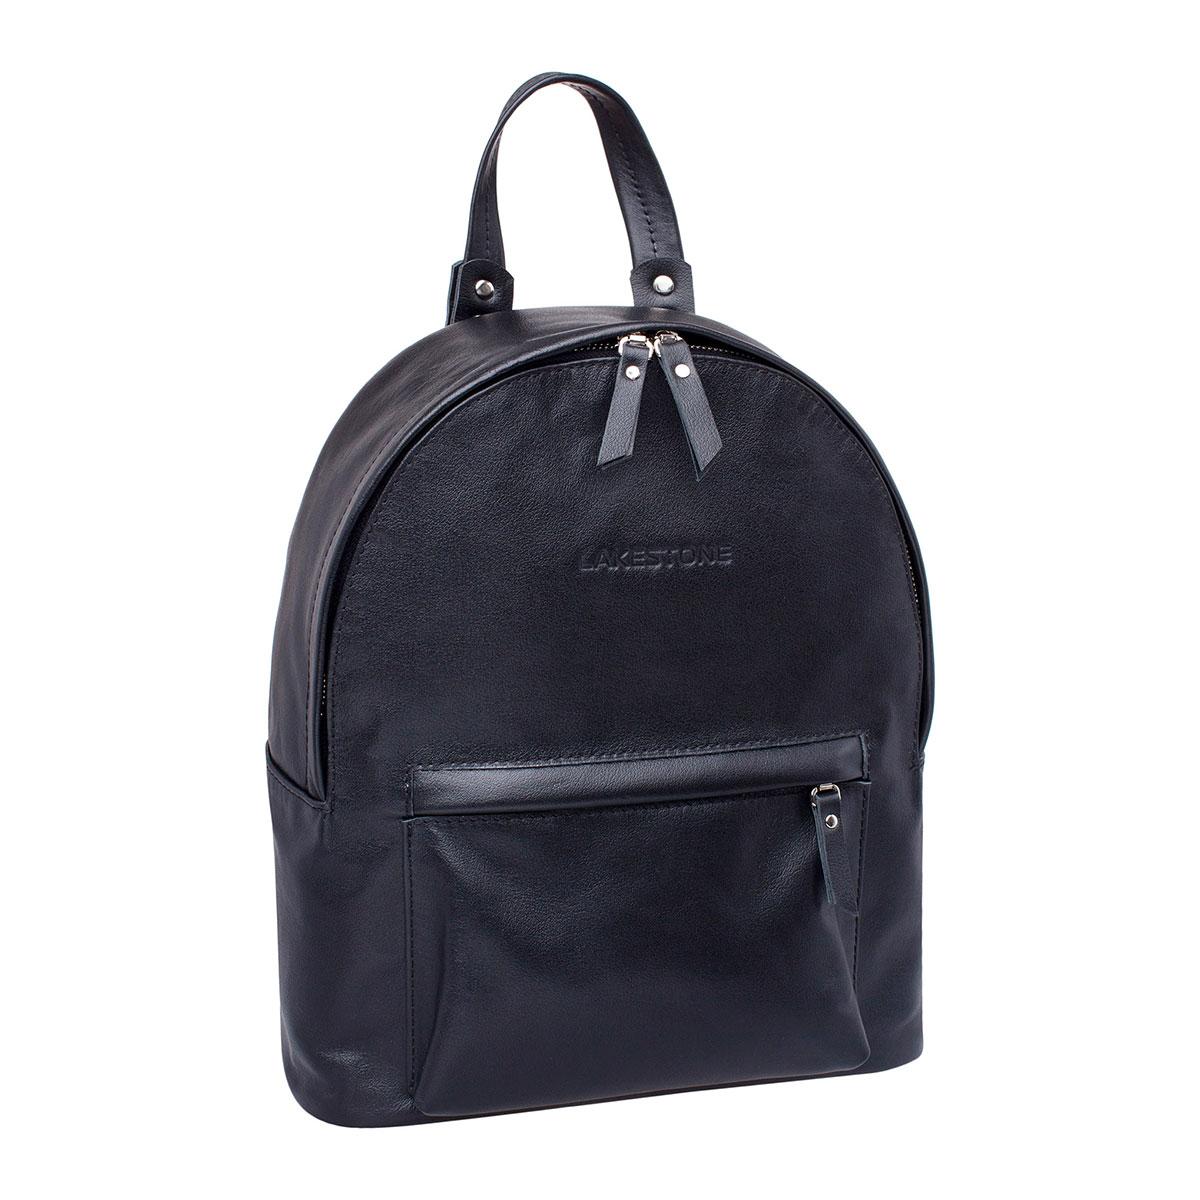 Рюкзак женский кожаный Lakestone 918101/BL фото